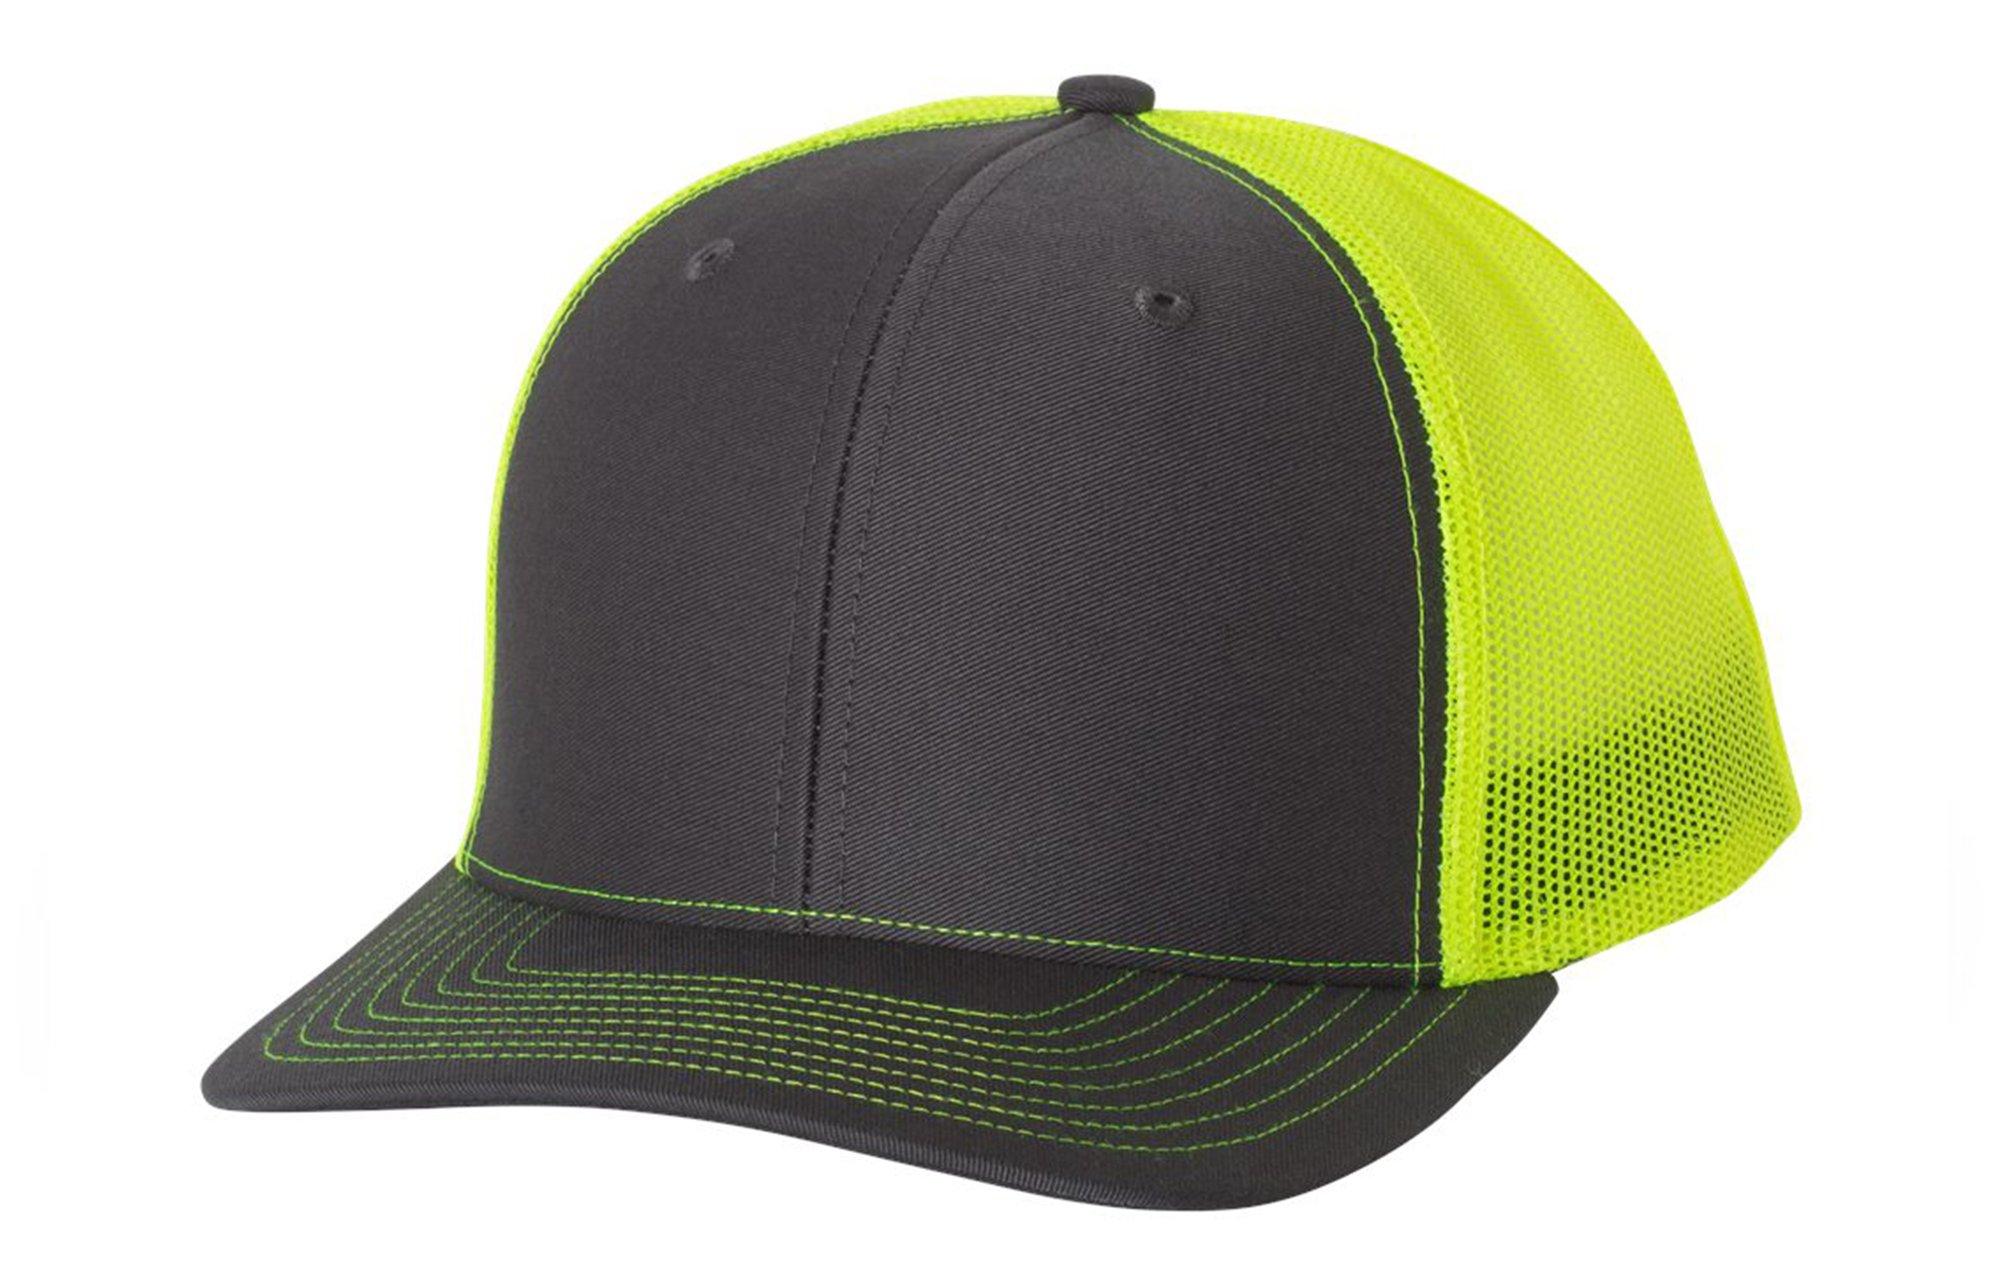 509d94cad36102 LogoUp Richardson 112 Trucker Snapback - Charcoal/Neon Yellow